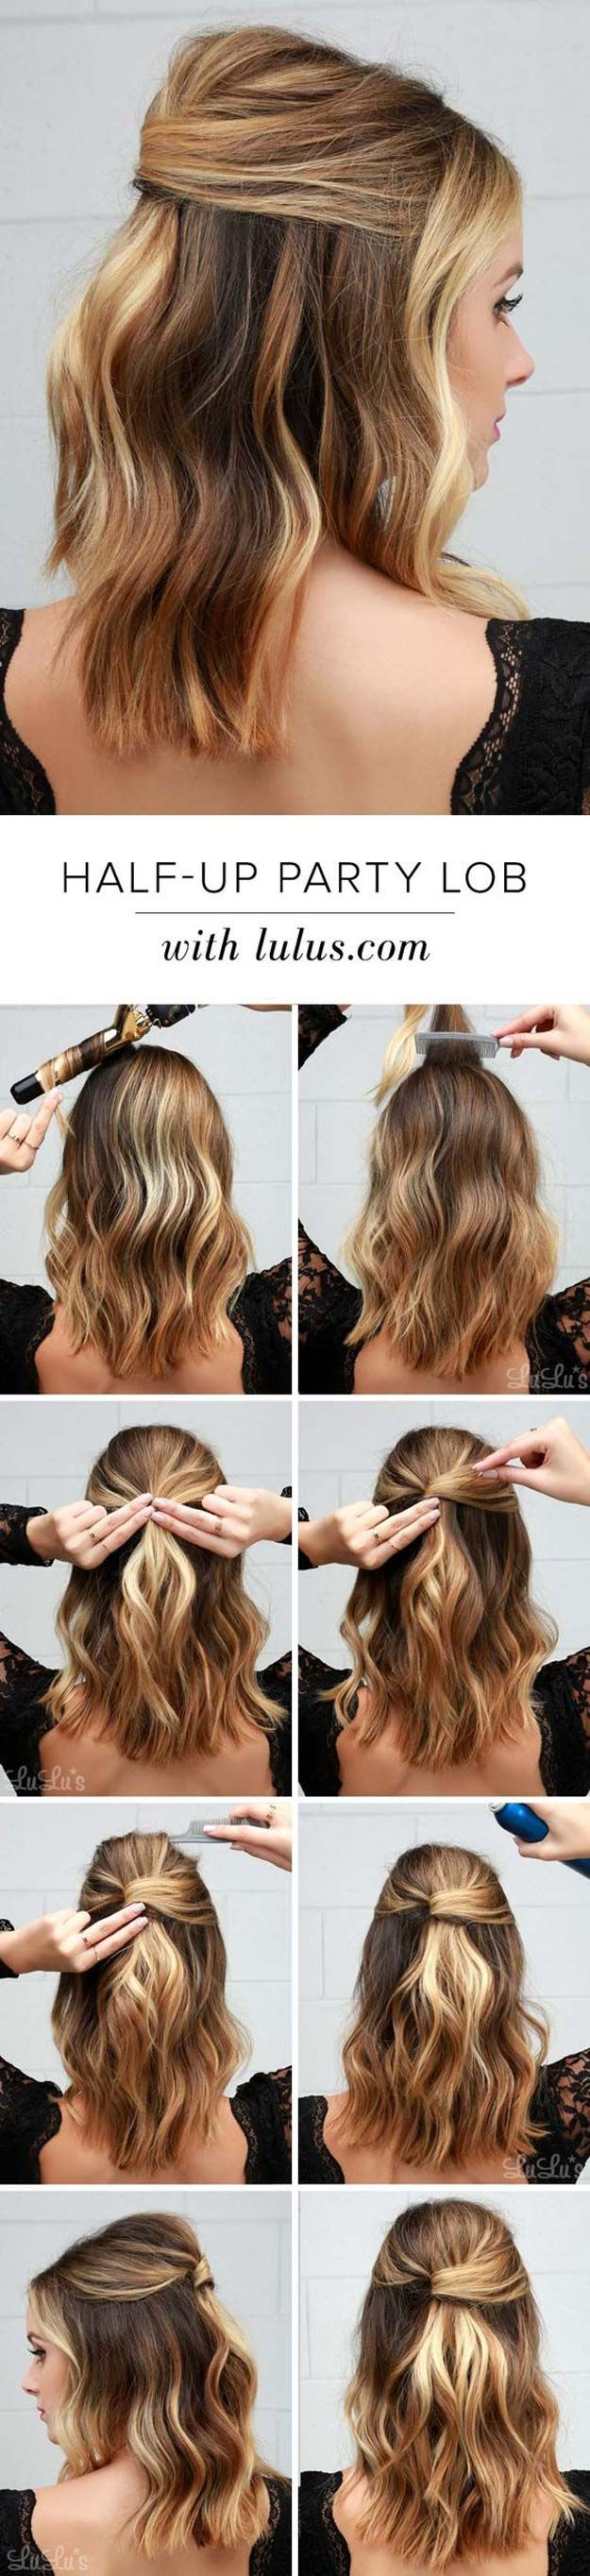 Marvelous 1000 Ideas About Easy Work Hairstyles On Pinterest Work Short Hairstyles Gunalazisus